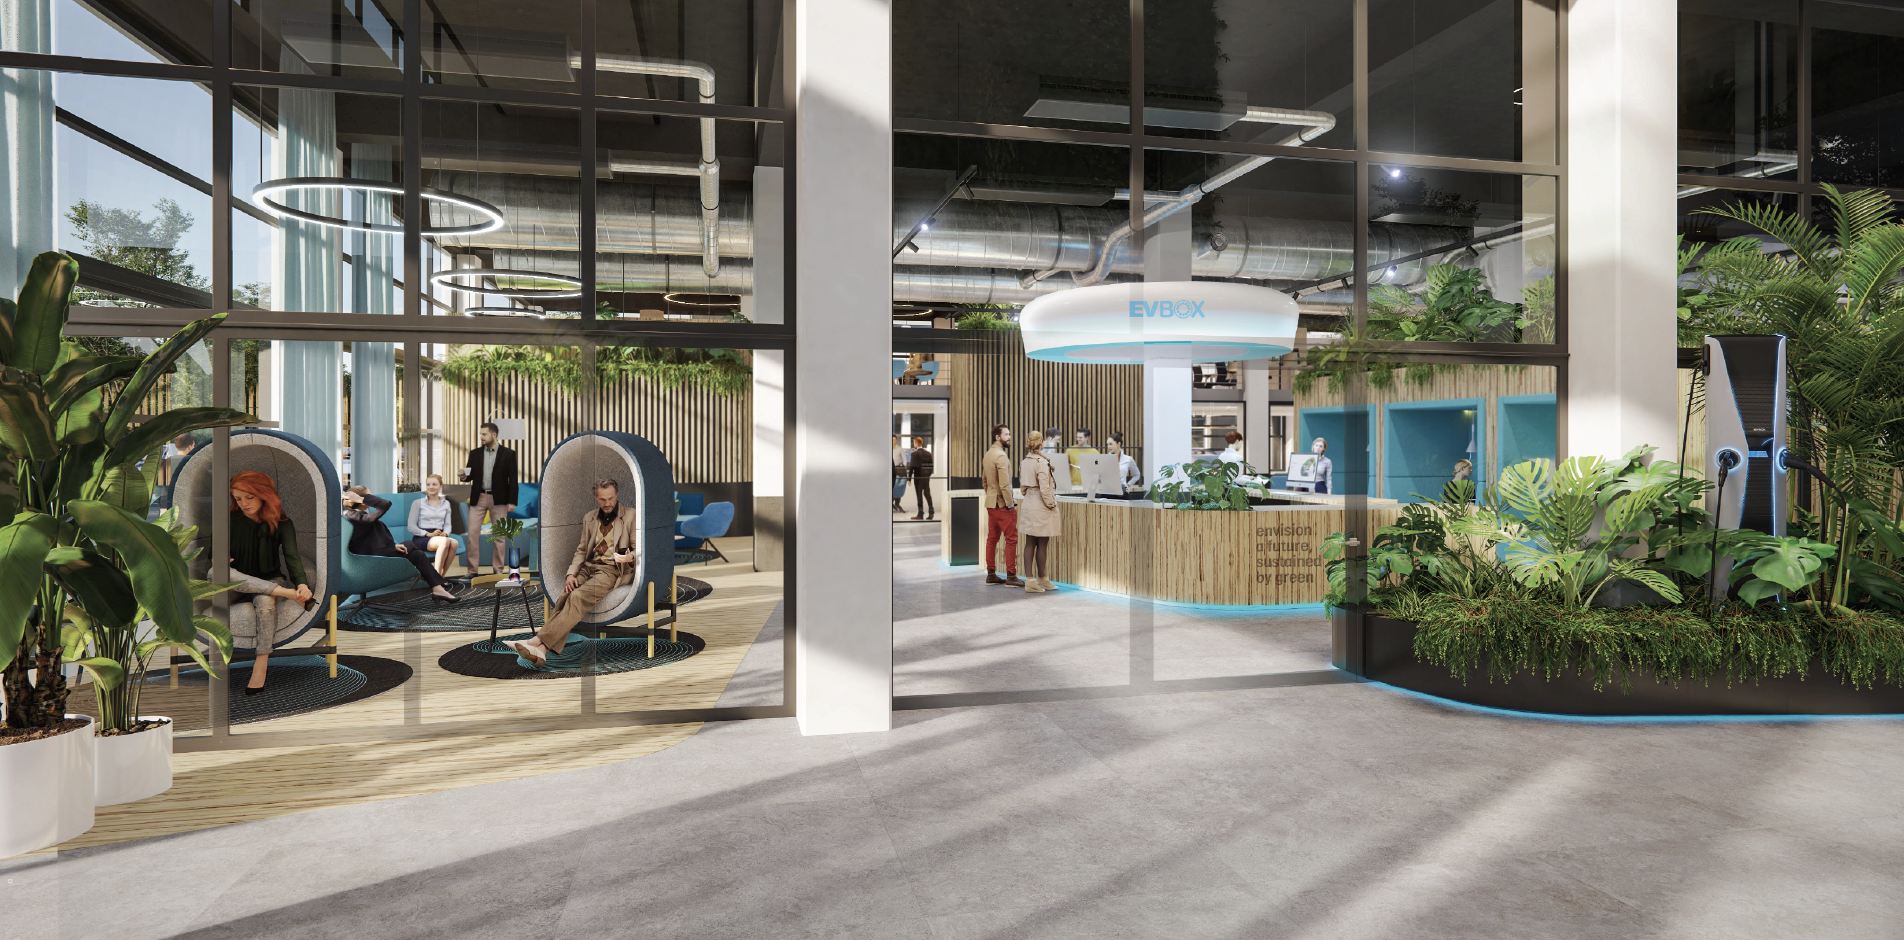 EVBox nouveau siège social Amsterdam.png